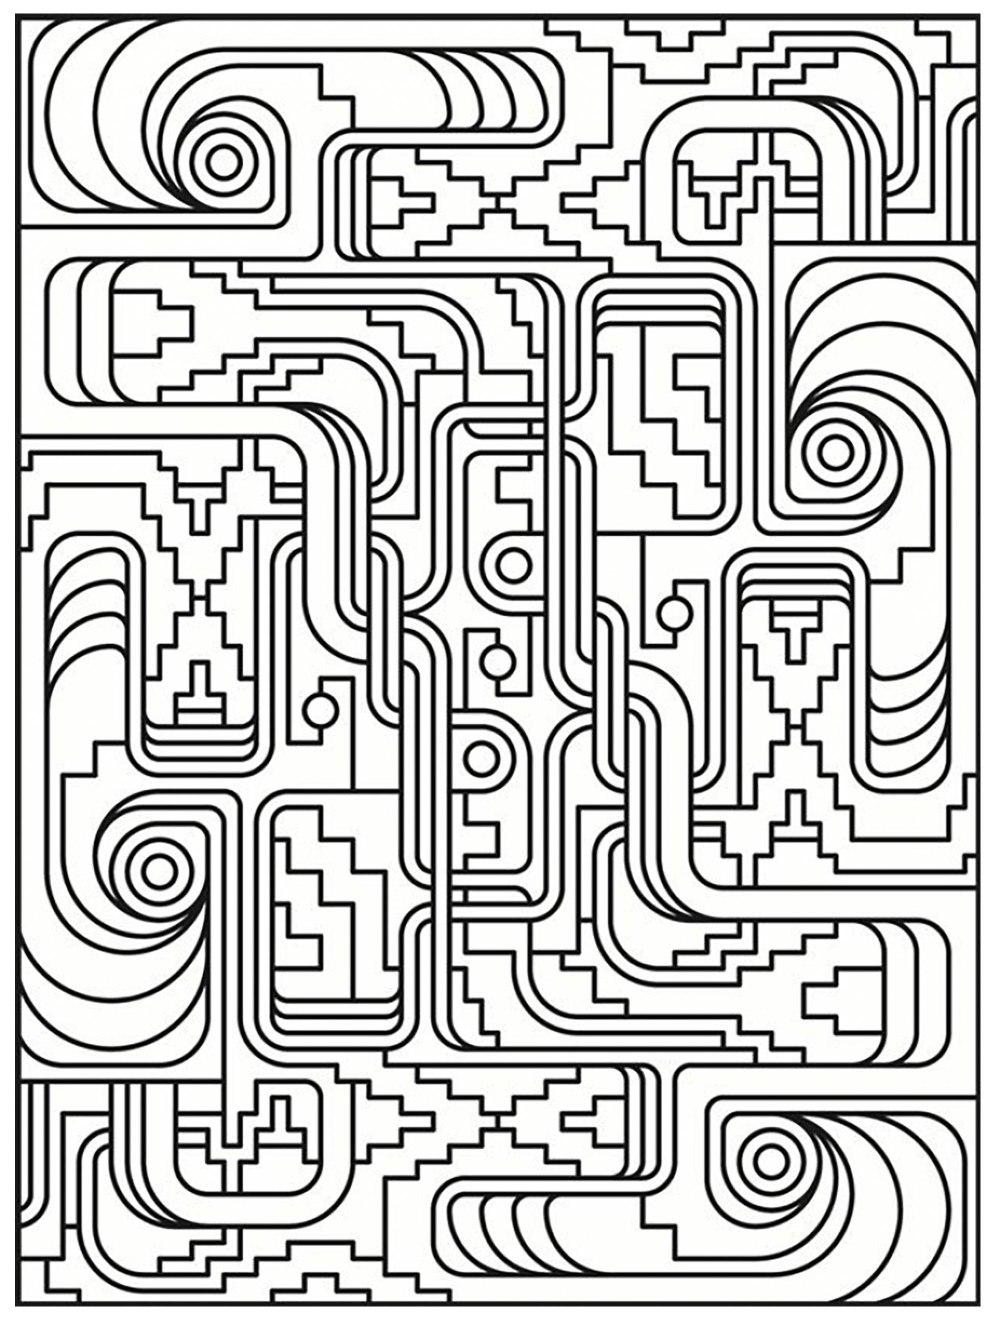 coloring-art-deco-simple-pattern